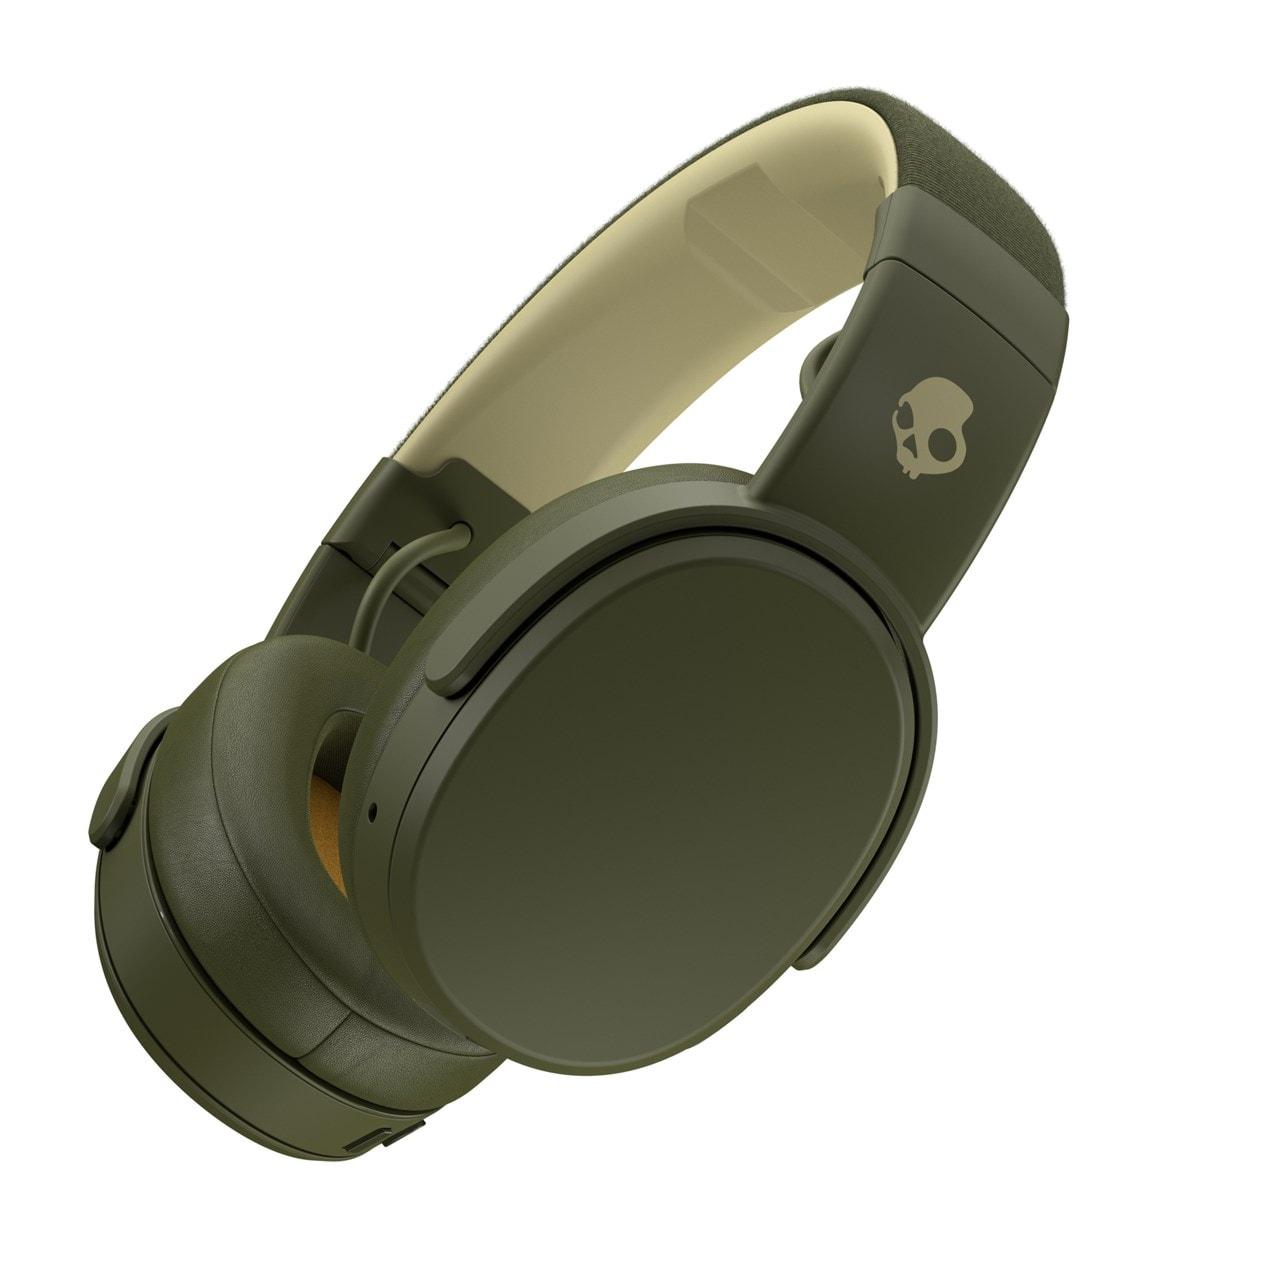 Skullcandy Crusher Moss/Olive/Yellow Bluetooth Headphones - 2